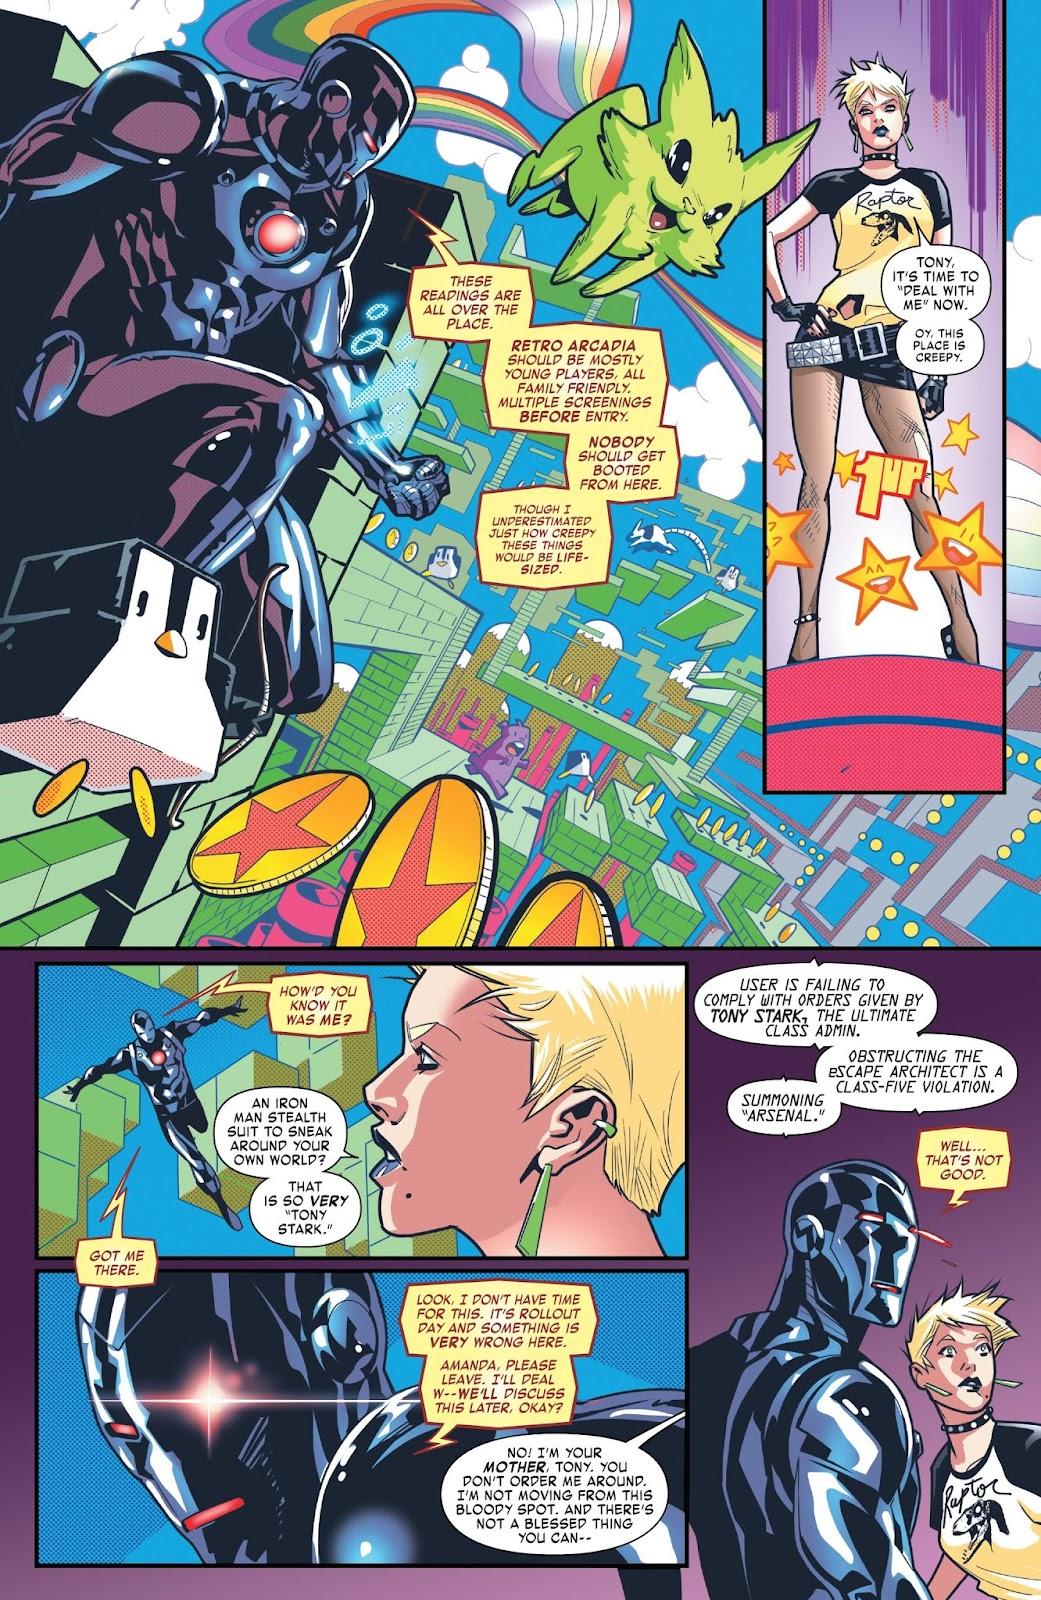 Read online Tony Stark: Iron Man comic -  Issue #6 - 17